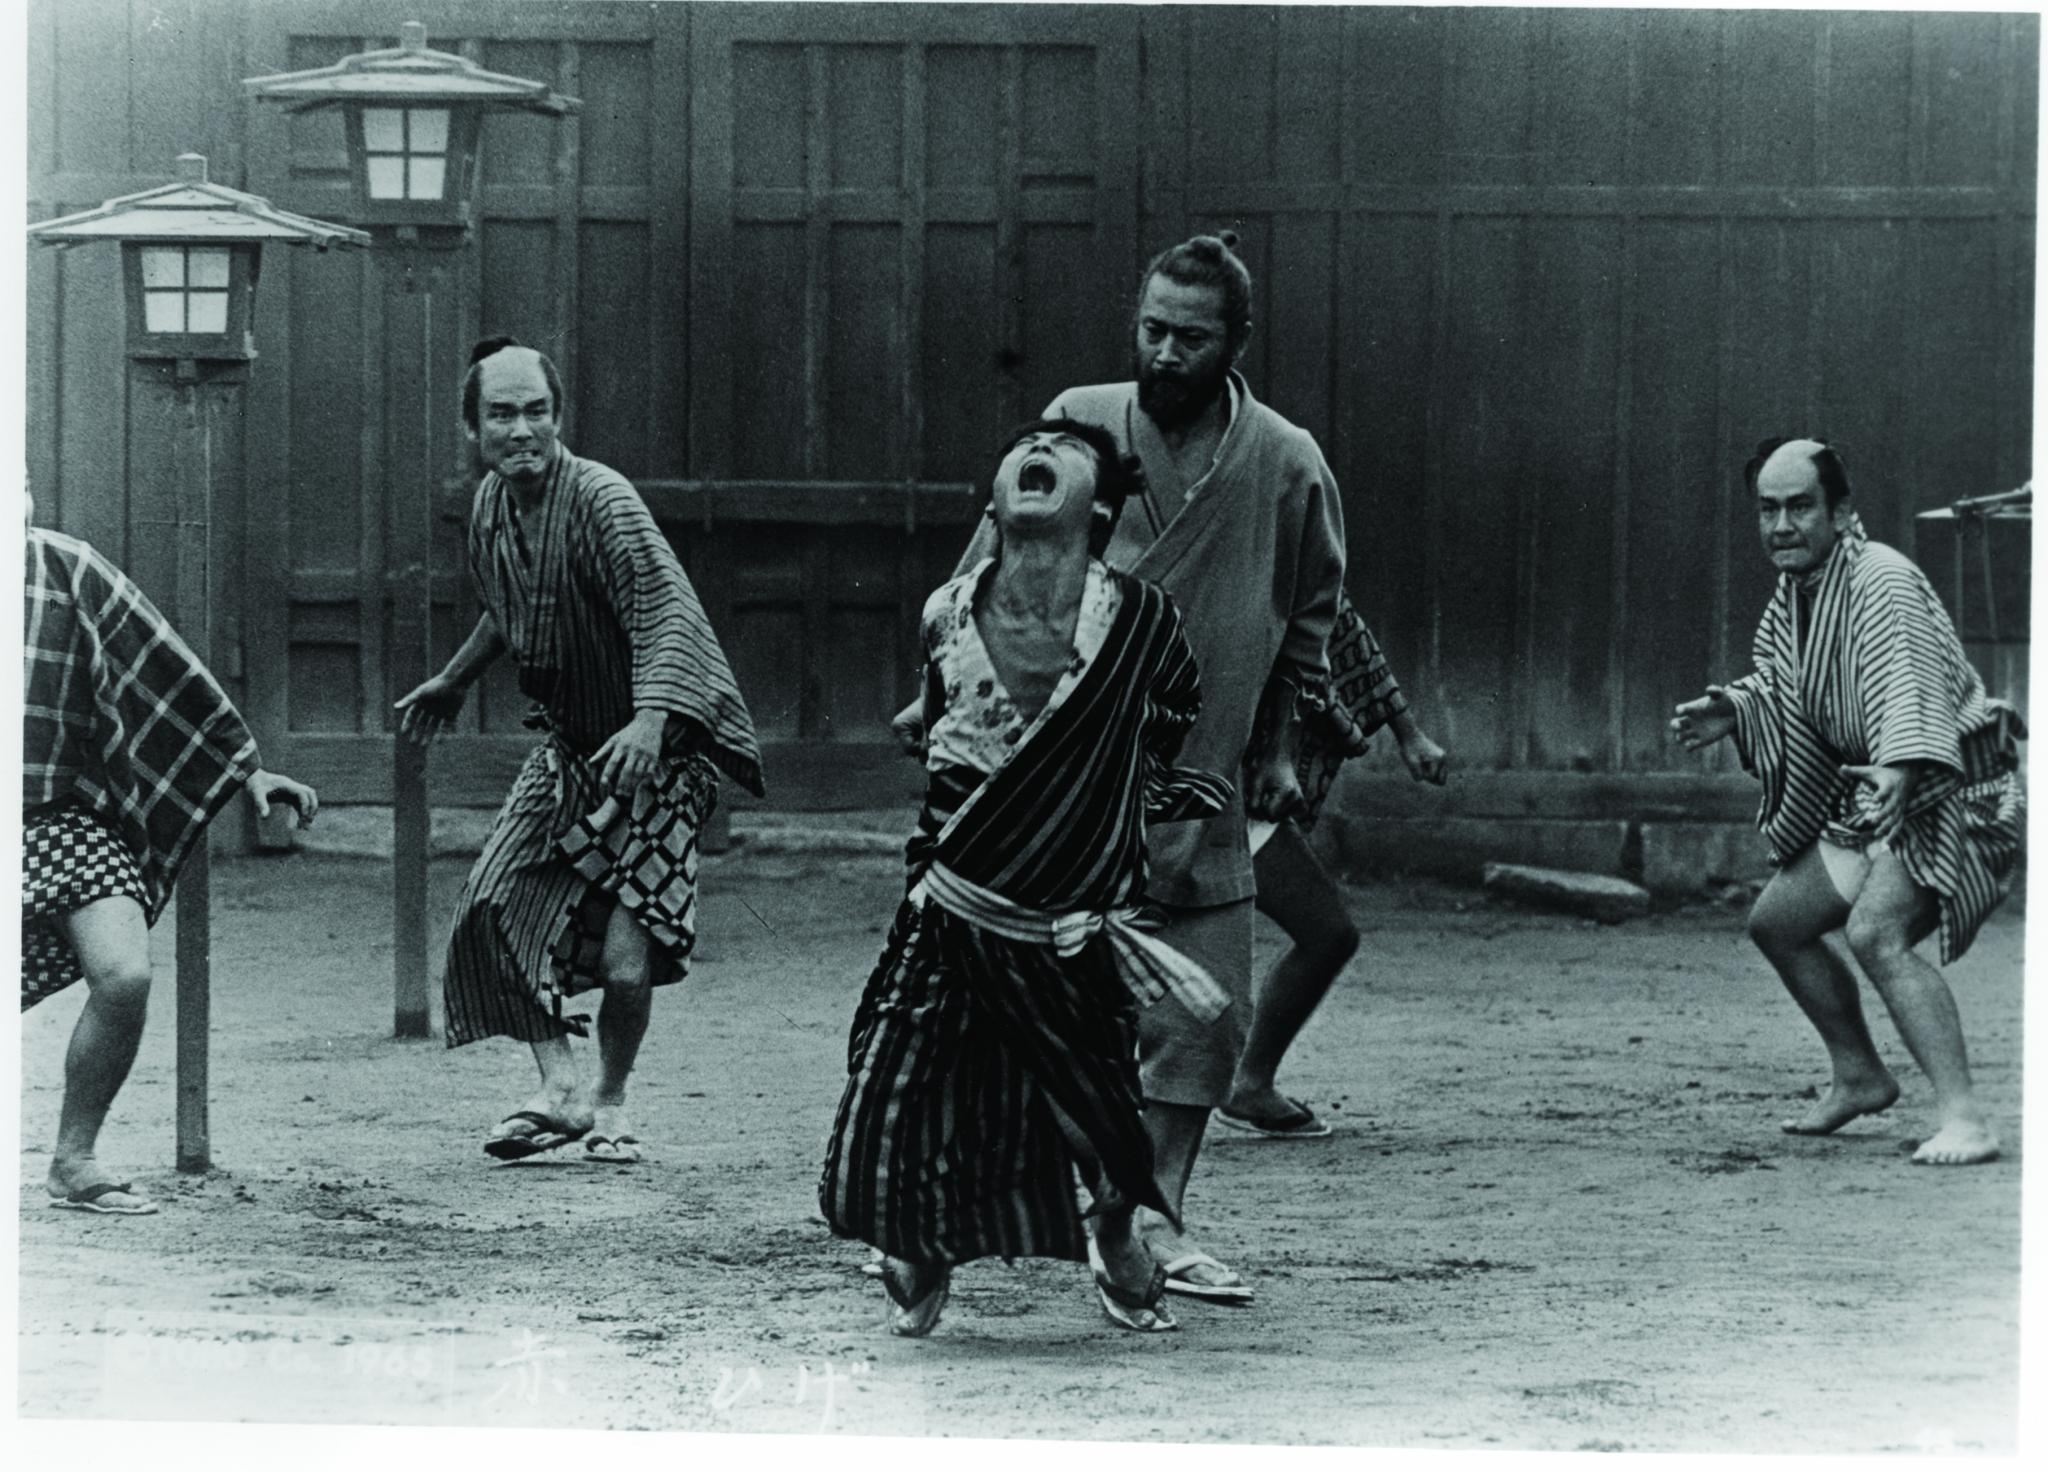 Toshirô Mifune in Akahige (1965)